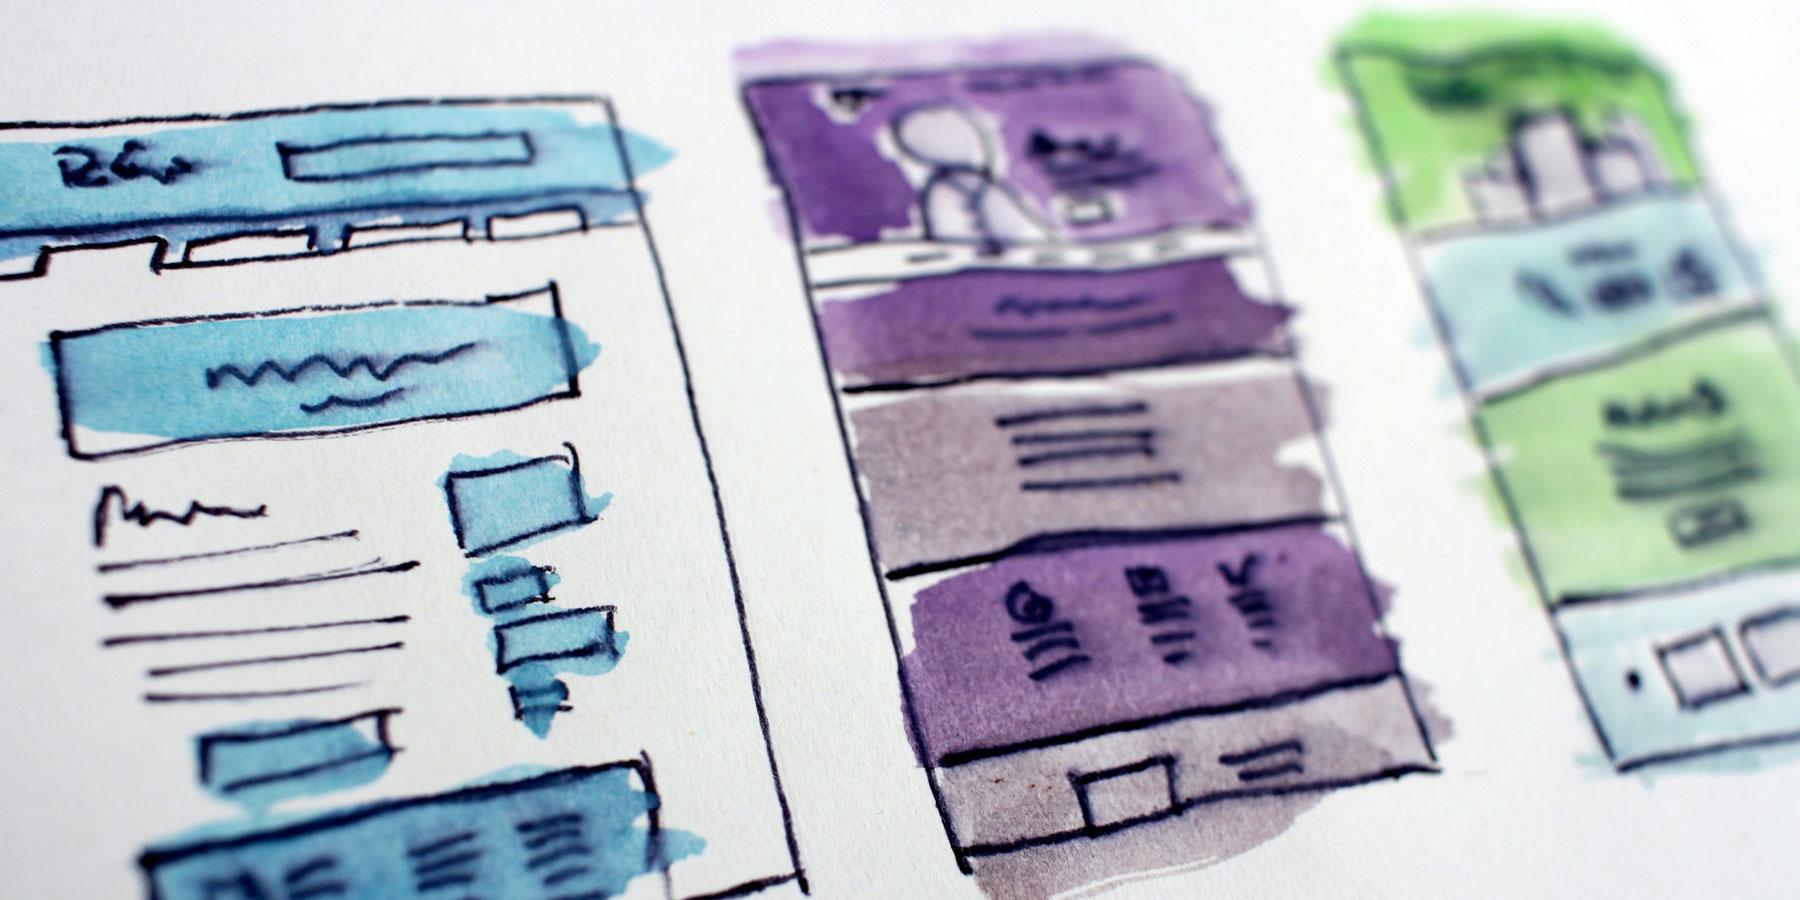 Q&A How do websites work